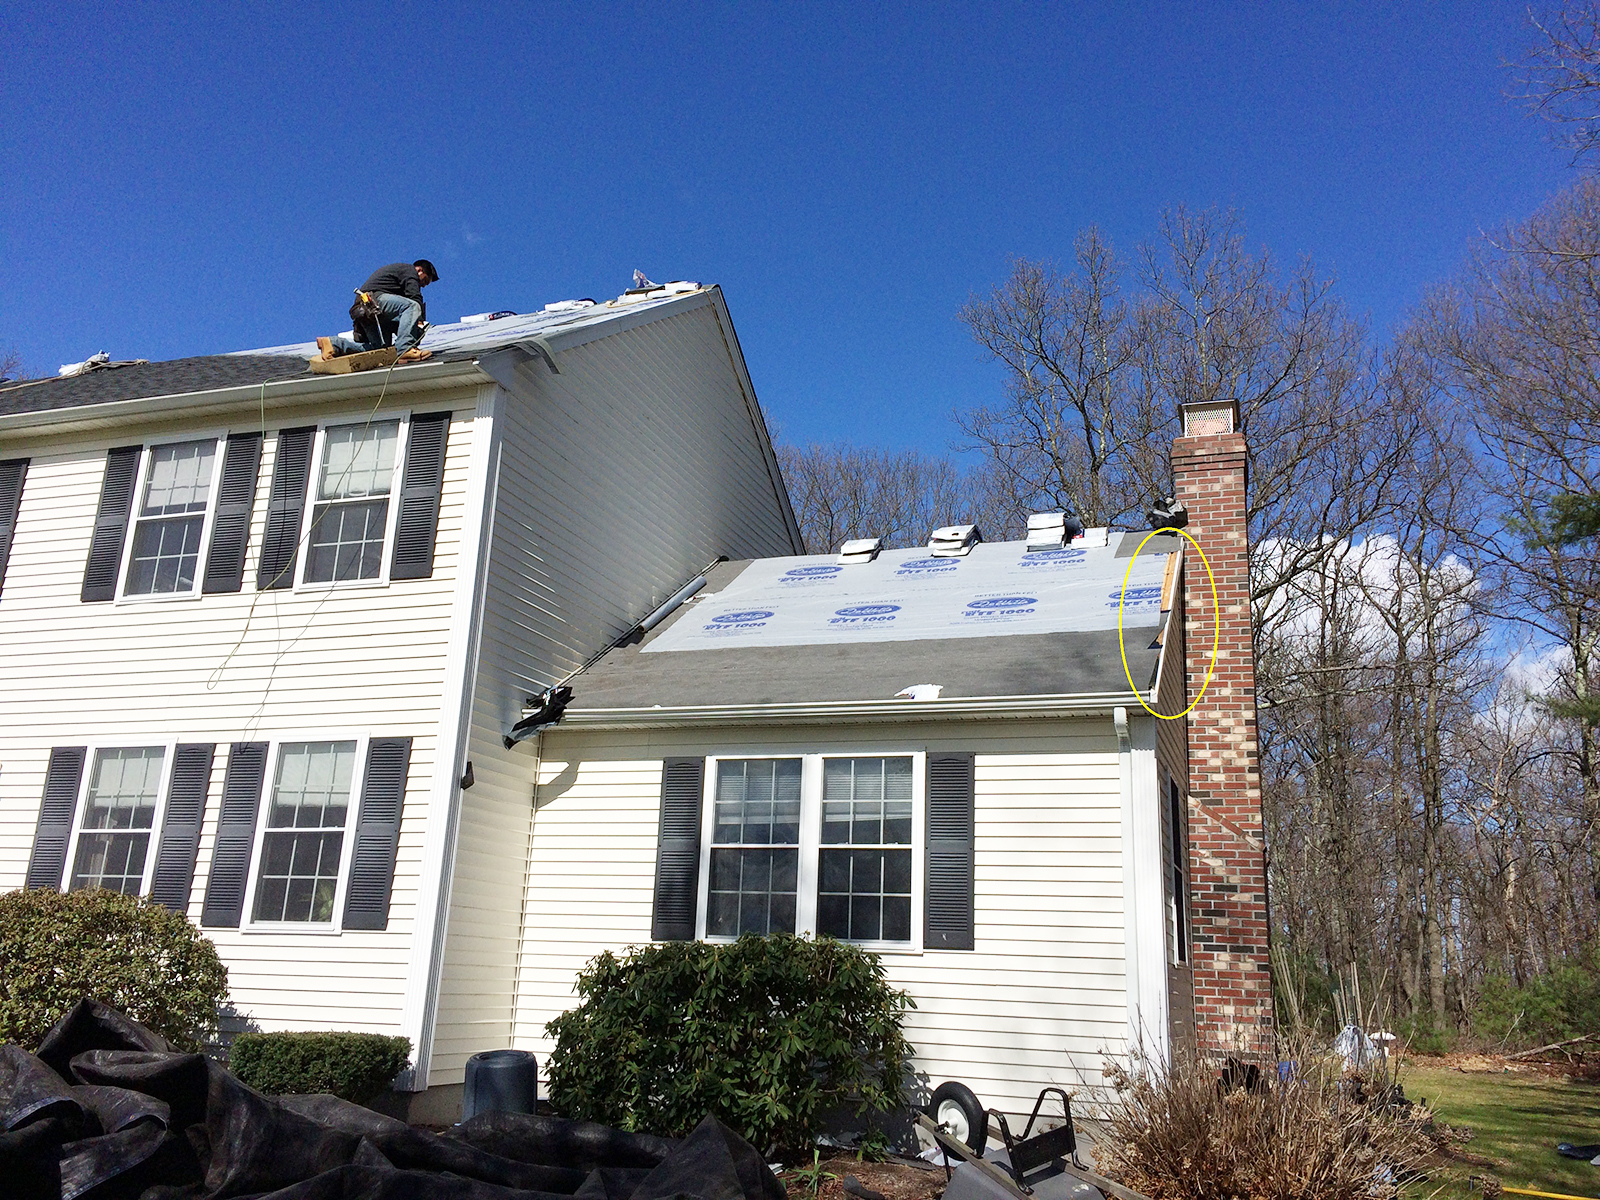 Marine_roofing